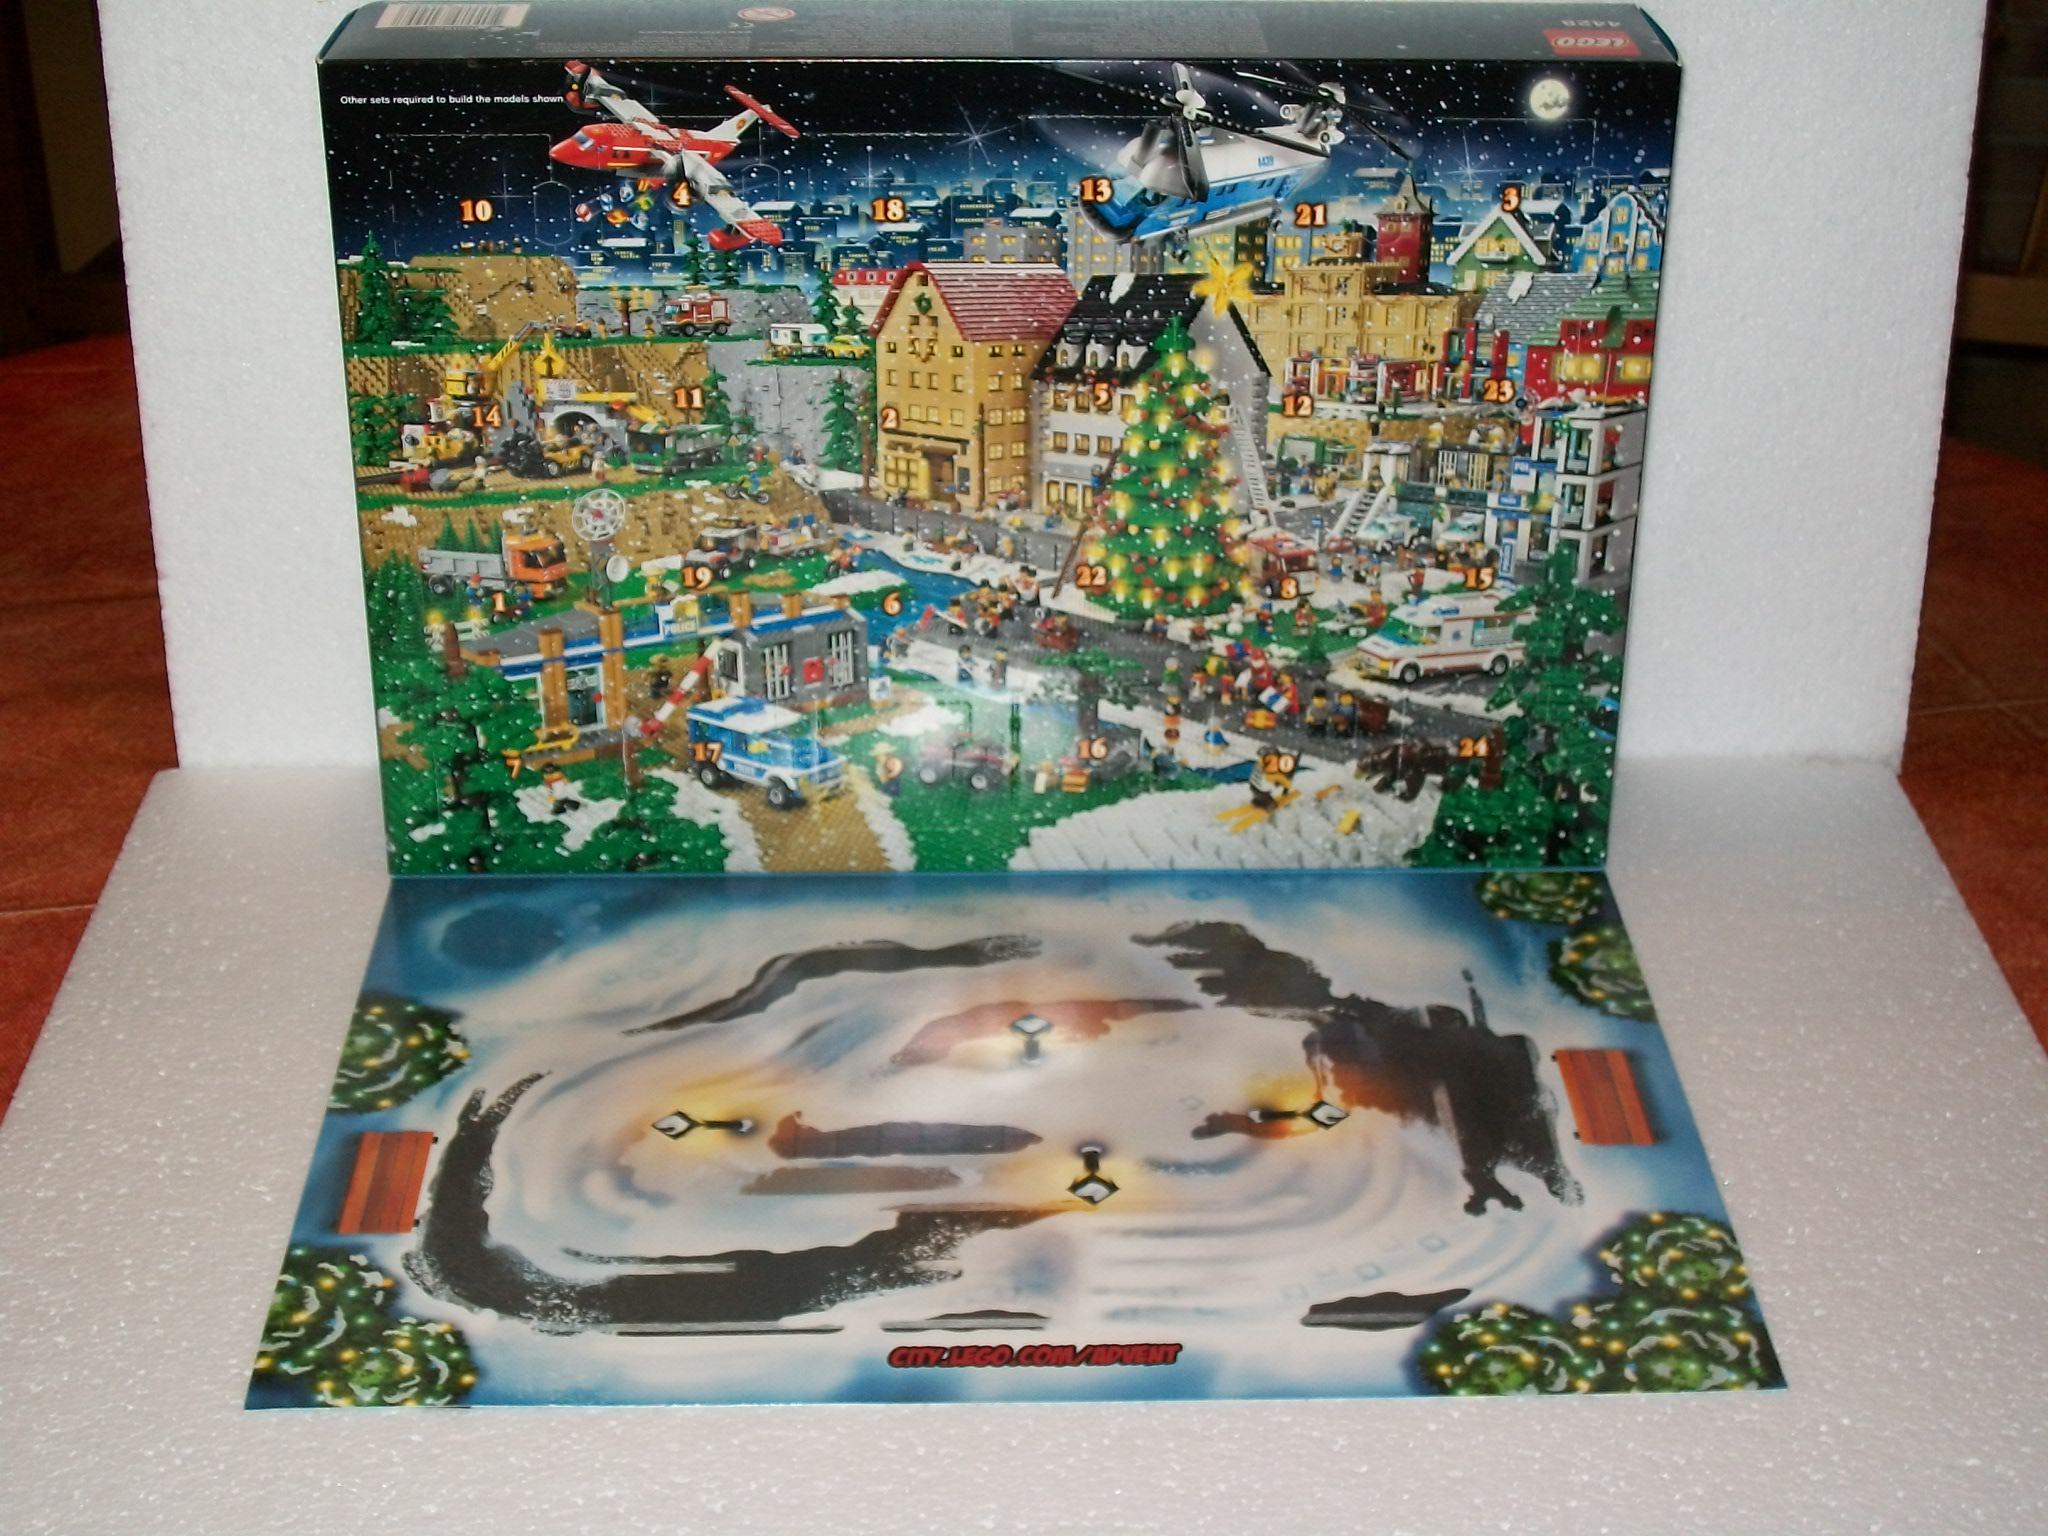 les calendriers de l avent lego lego r by alkinoos. Black Bedroom Furniture Sets. Home Design Ideas